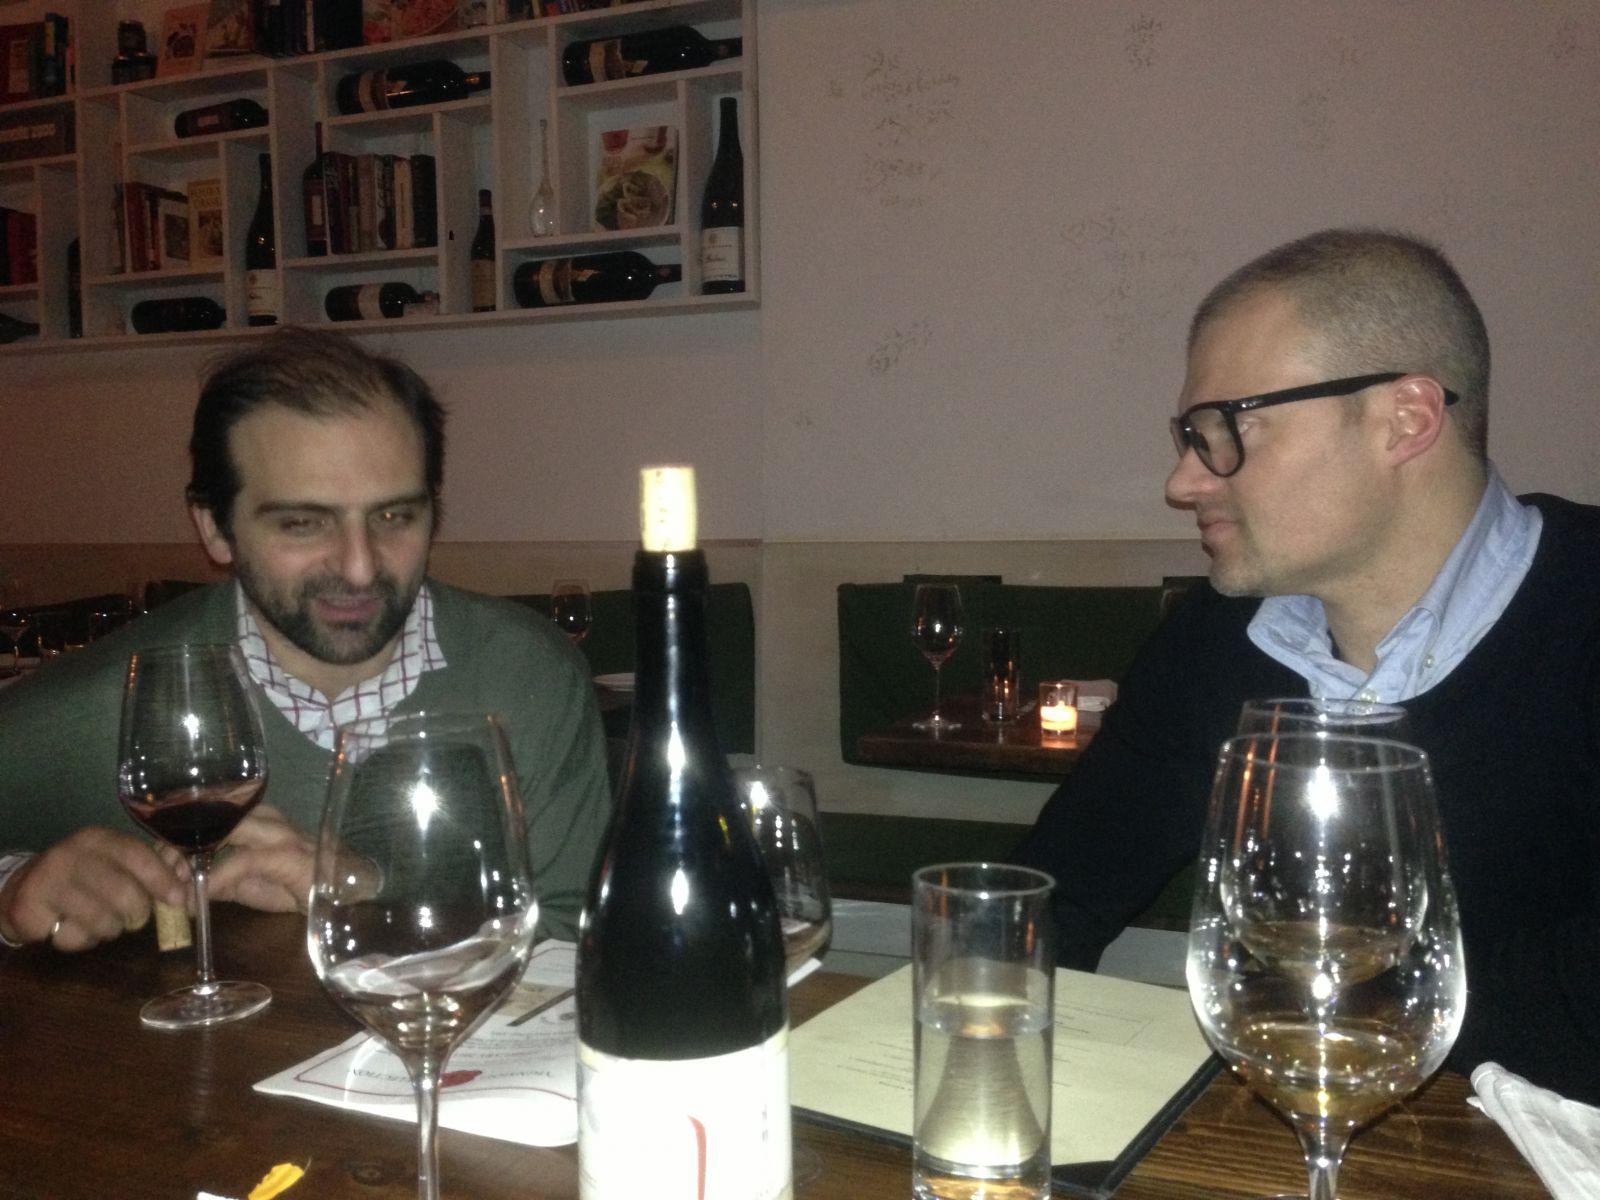 Dinner at Aroma kicthen with Vito Polosa